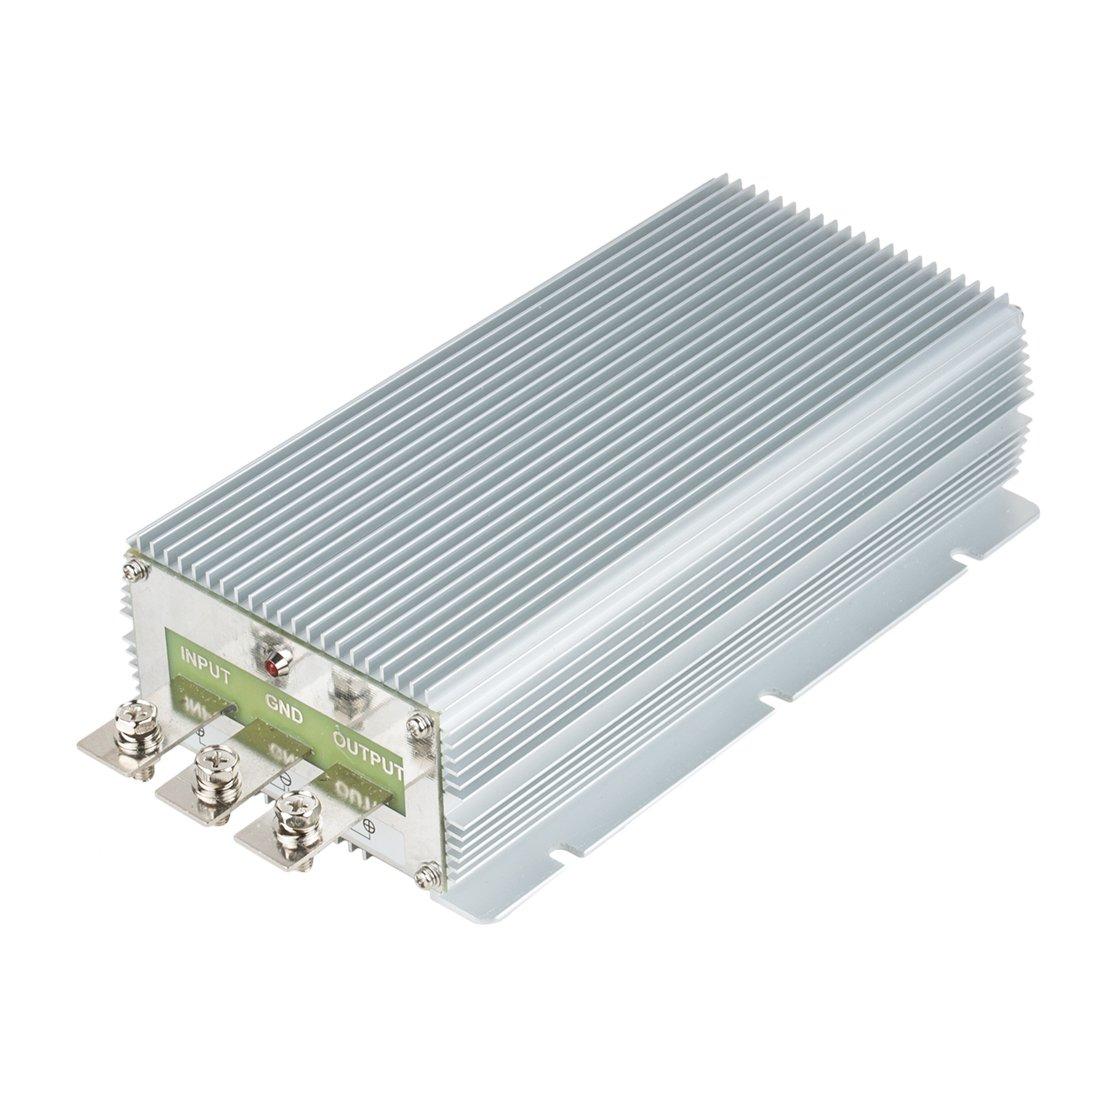 uxcell NEW High-Power Voltage Converter Regulator DC 24V Step-down to DC 12V 85A 1020W Car Truck Power Buck Transformer